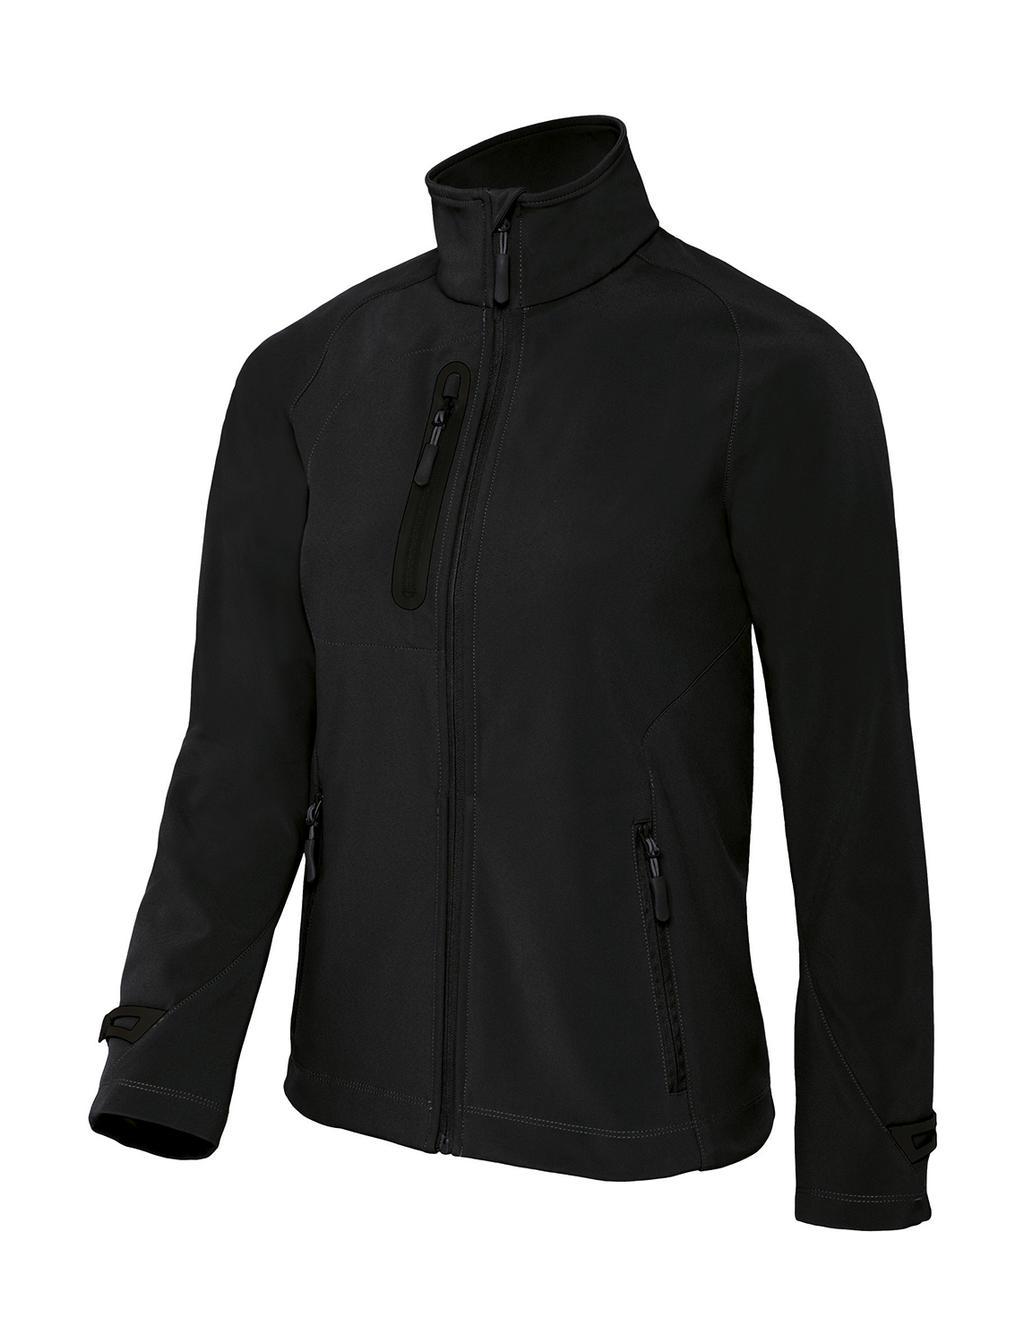 Dámský X-Lite Softshell/women Jacket - zvìtšit obrázek